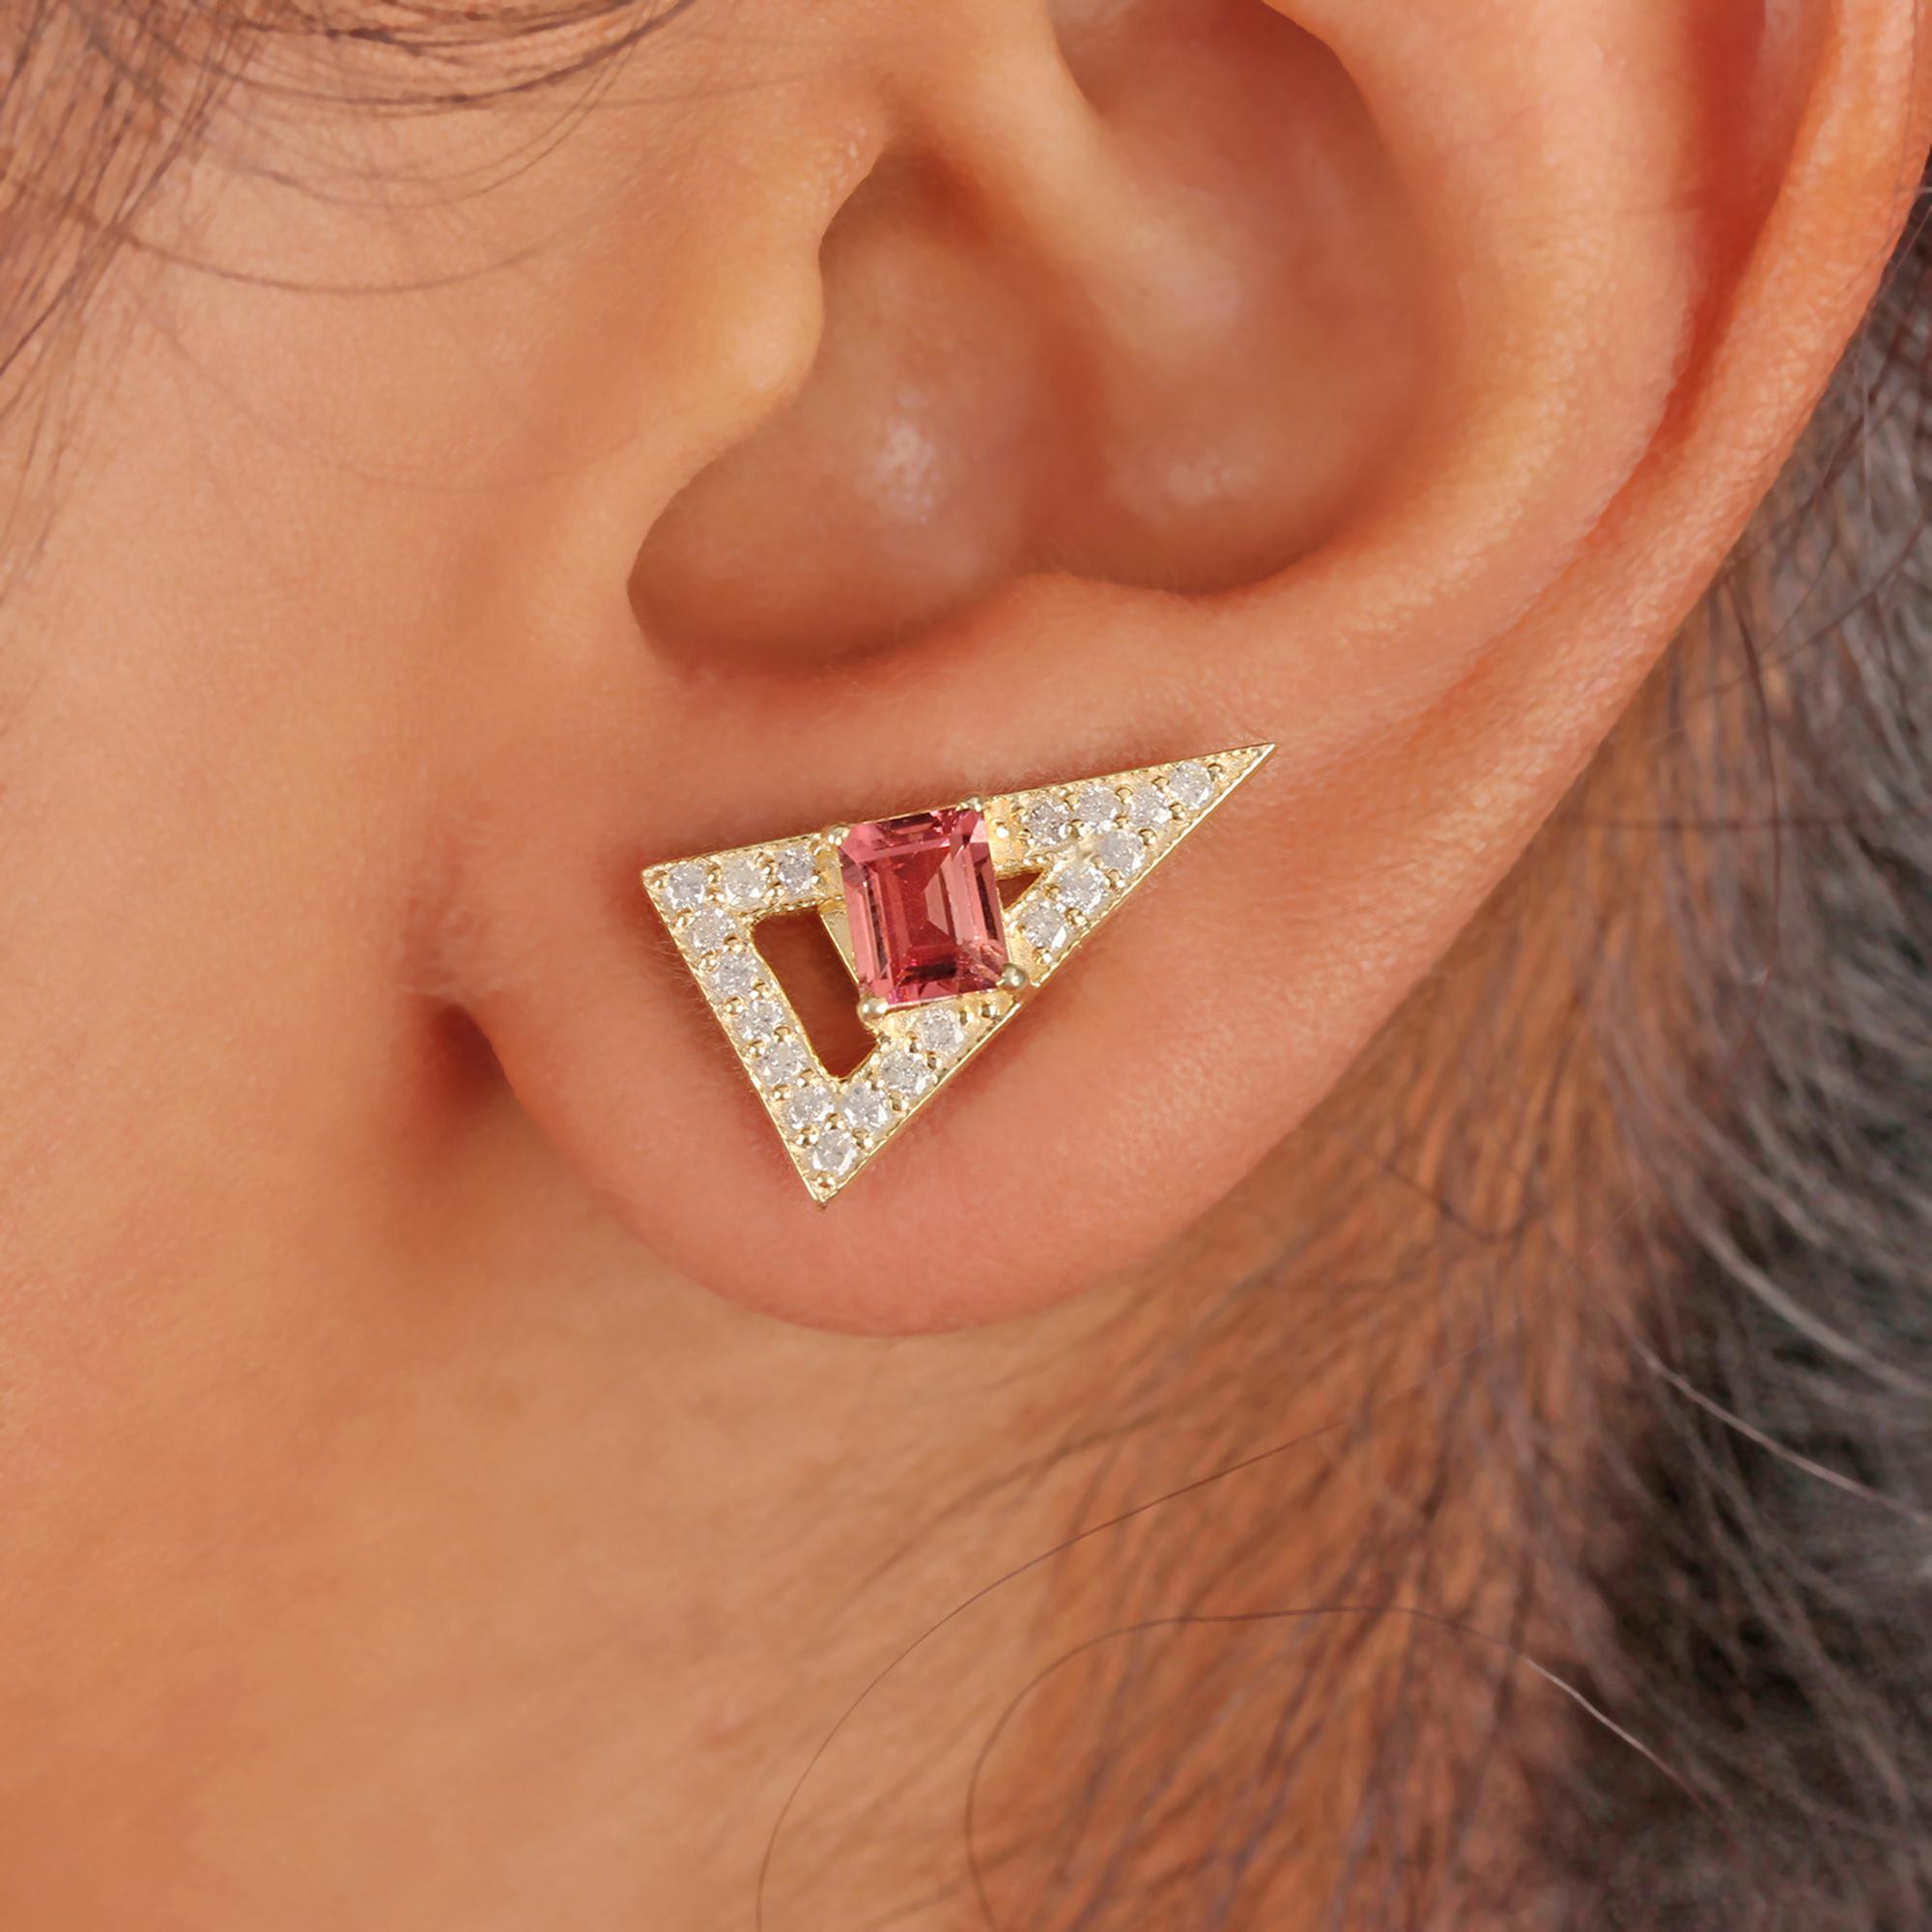 Natural Diamond & Pink Tourmaline 14k Solid Gold Stud Minimalist Earrings